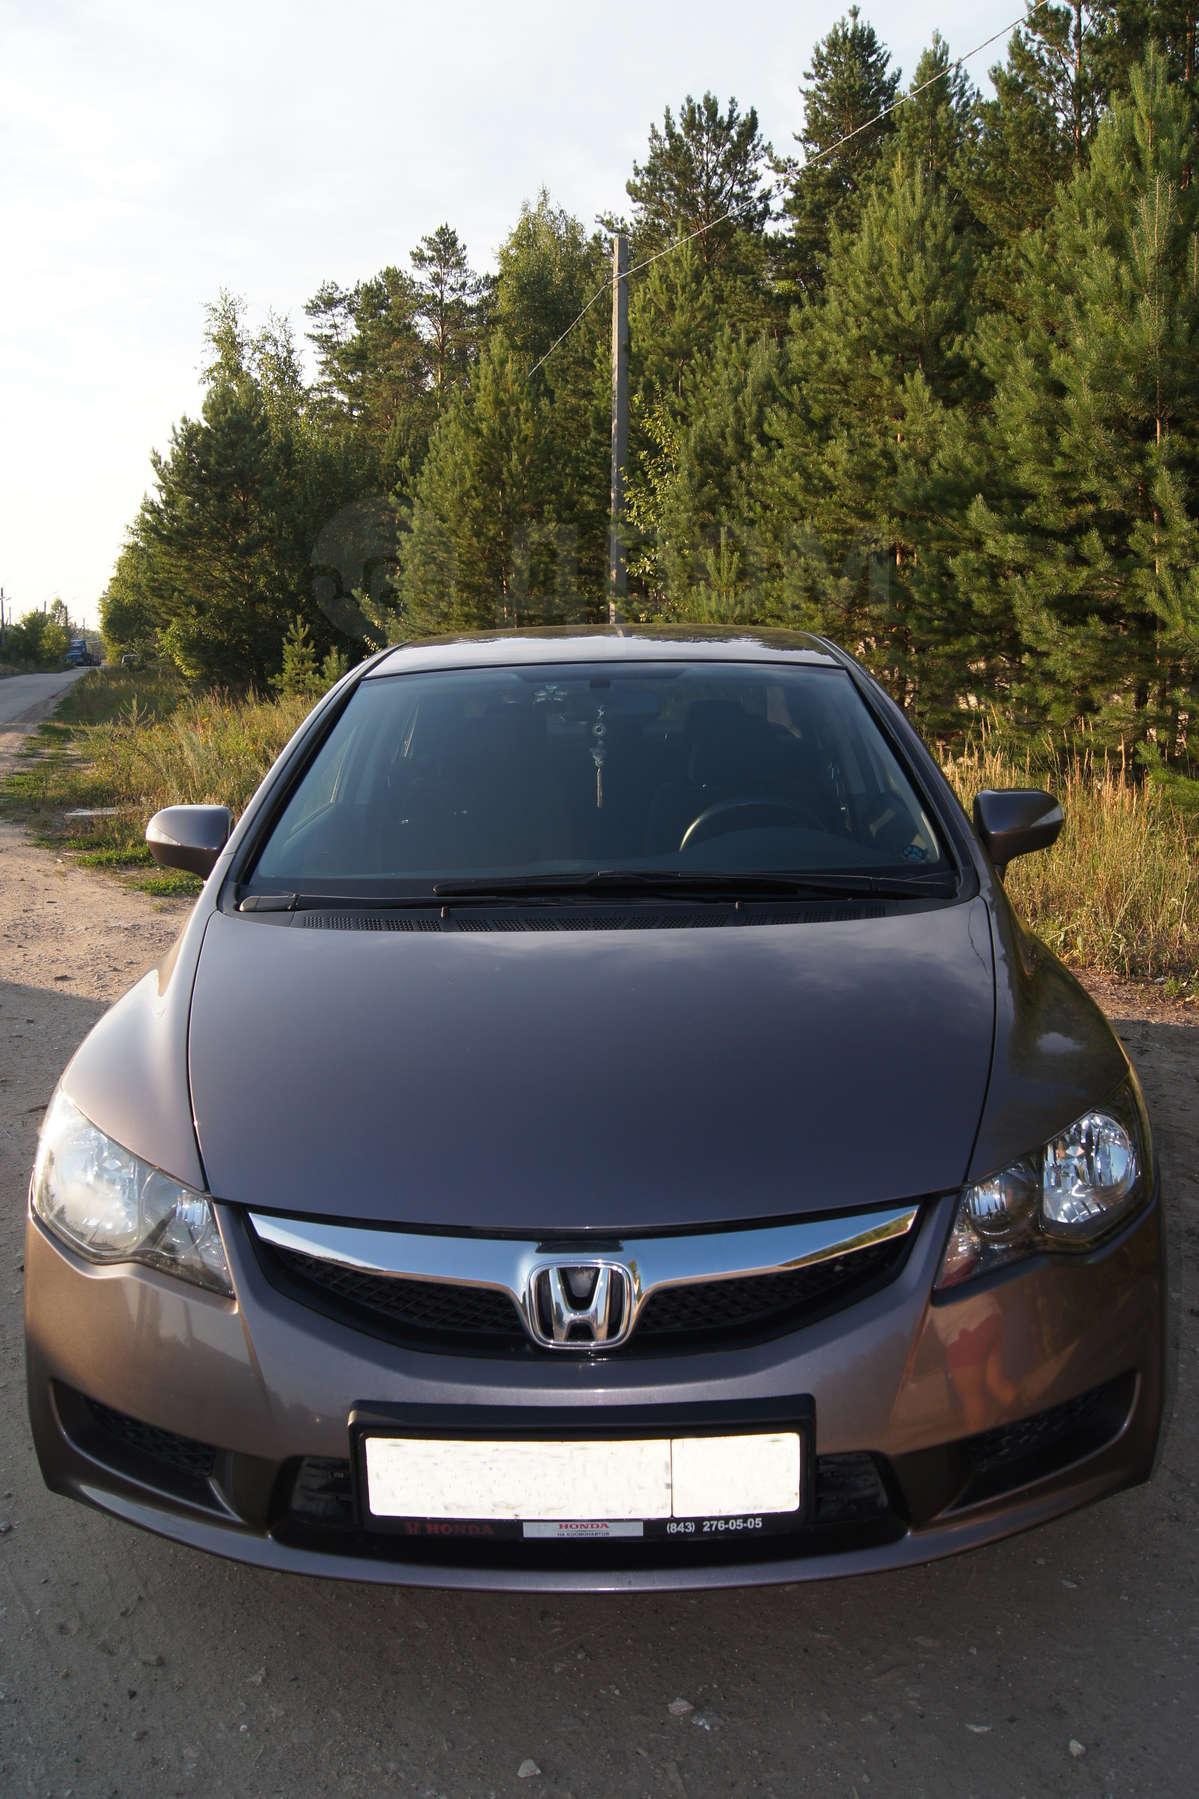 honda civic левый руль продажа: